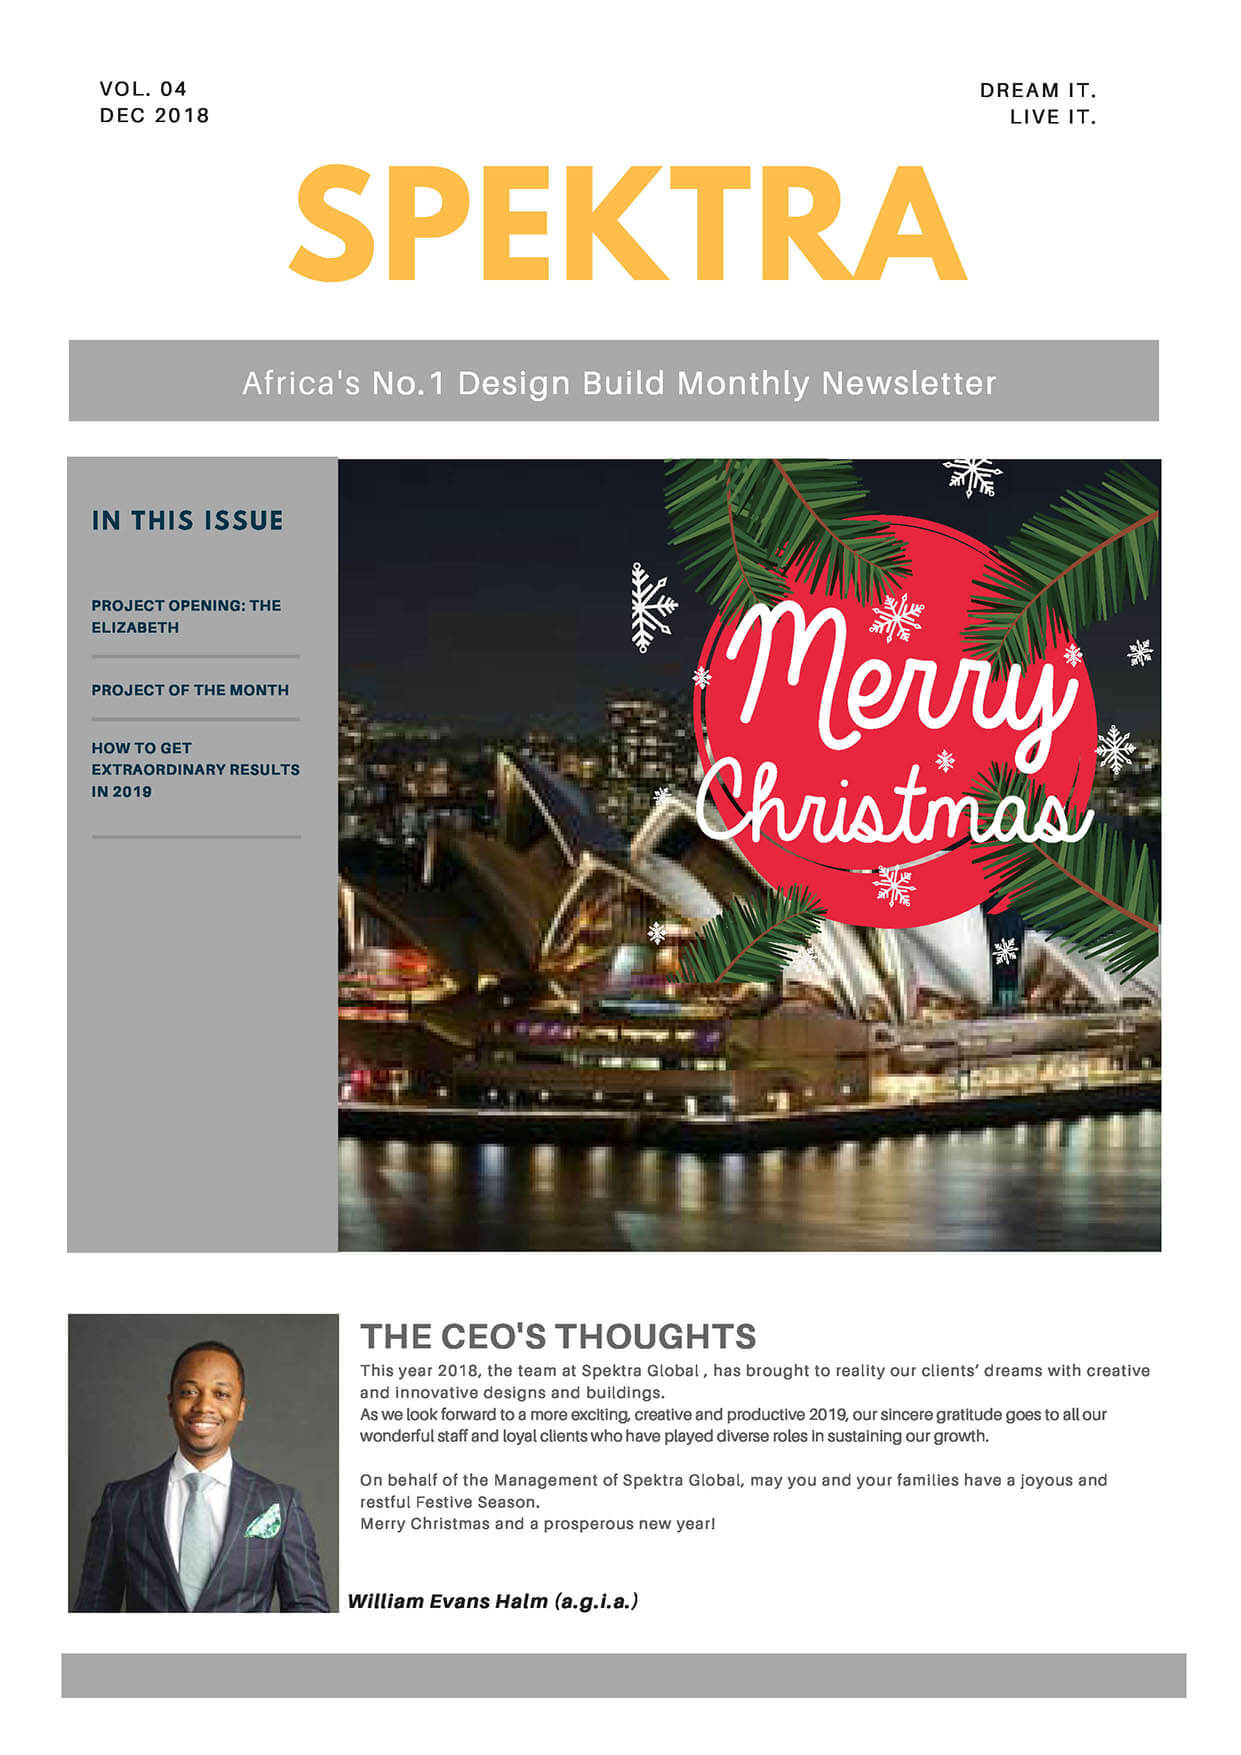 Issue 4 December 2018 - Spektra Newsletter_front-1